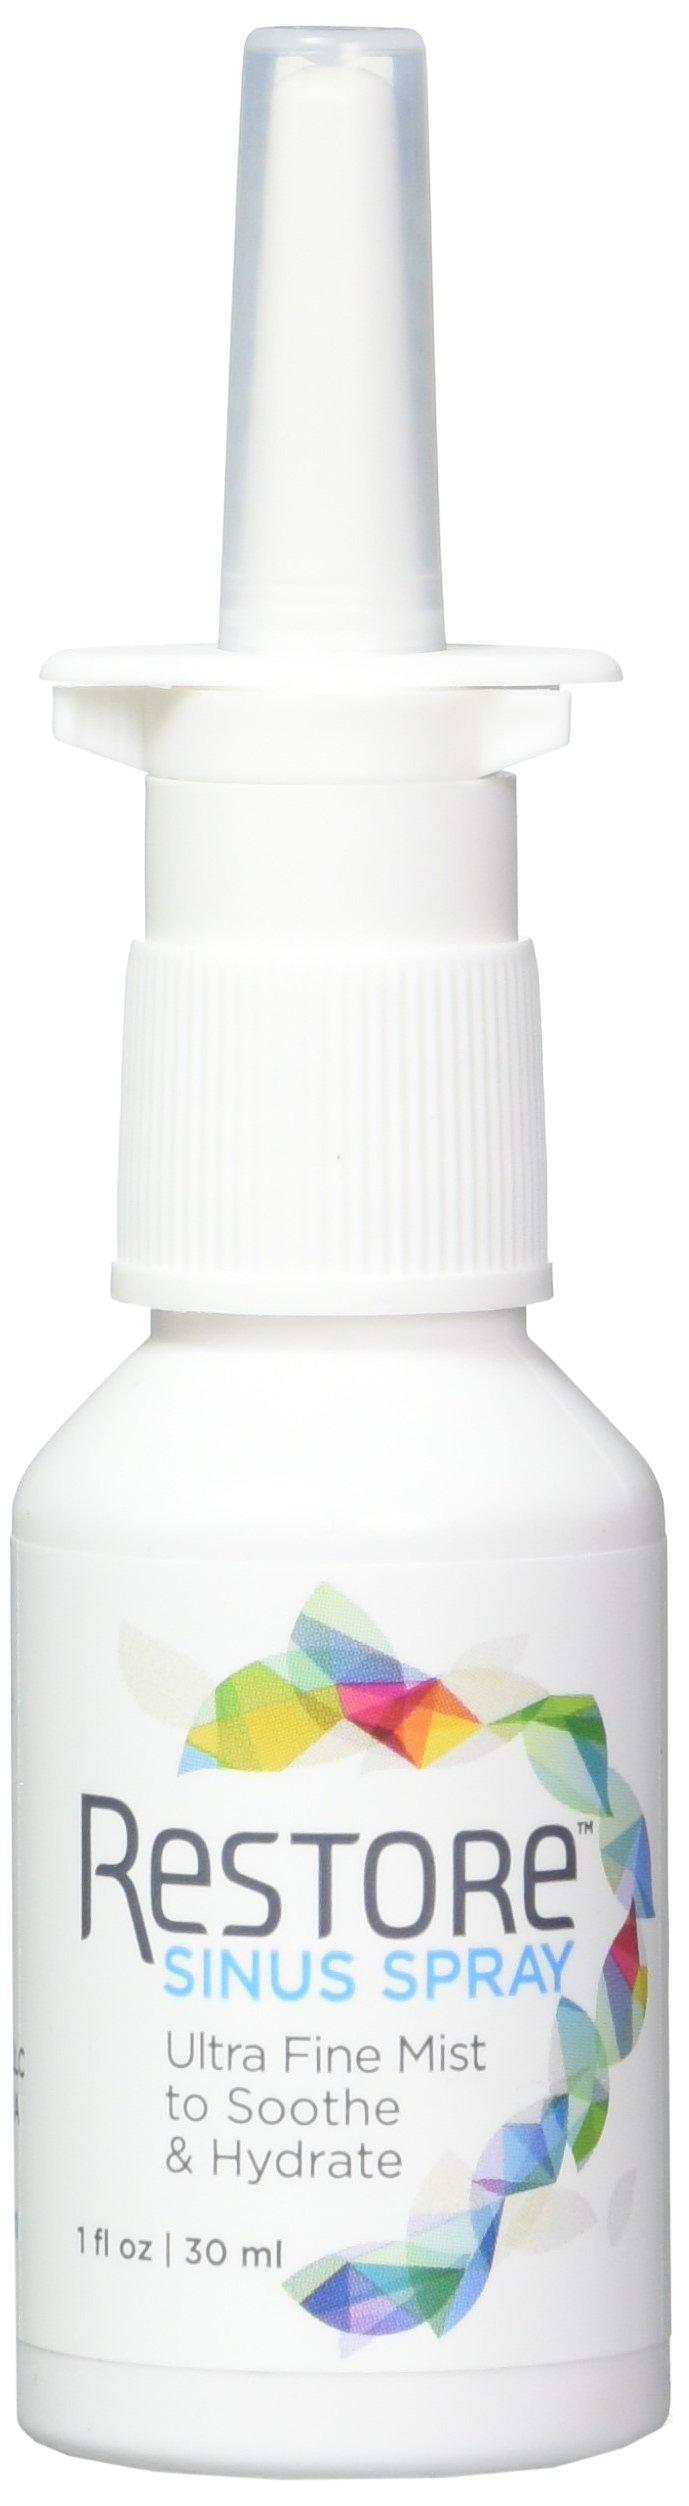 RESTORE Sinus Spray | Restore 4 Life Ultra Fine Mist to Soothe & Hydrate |